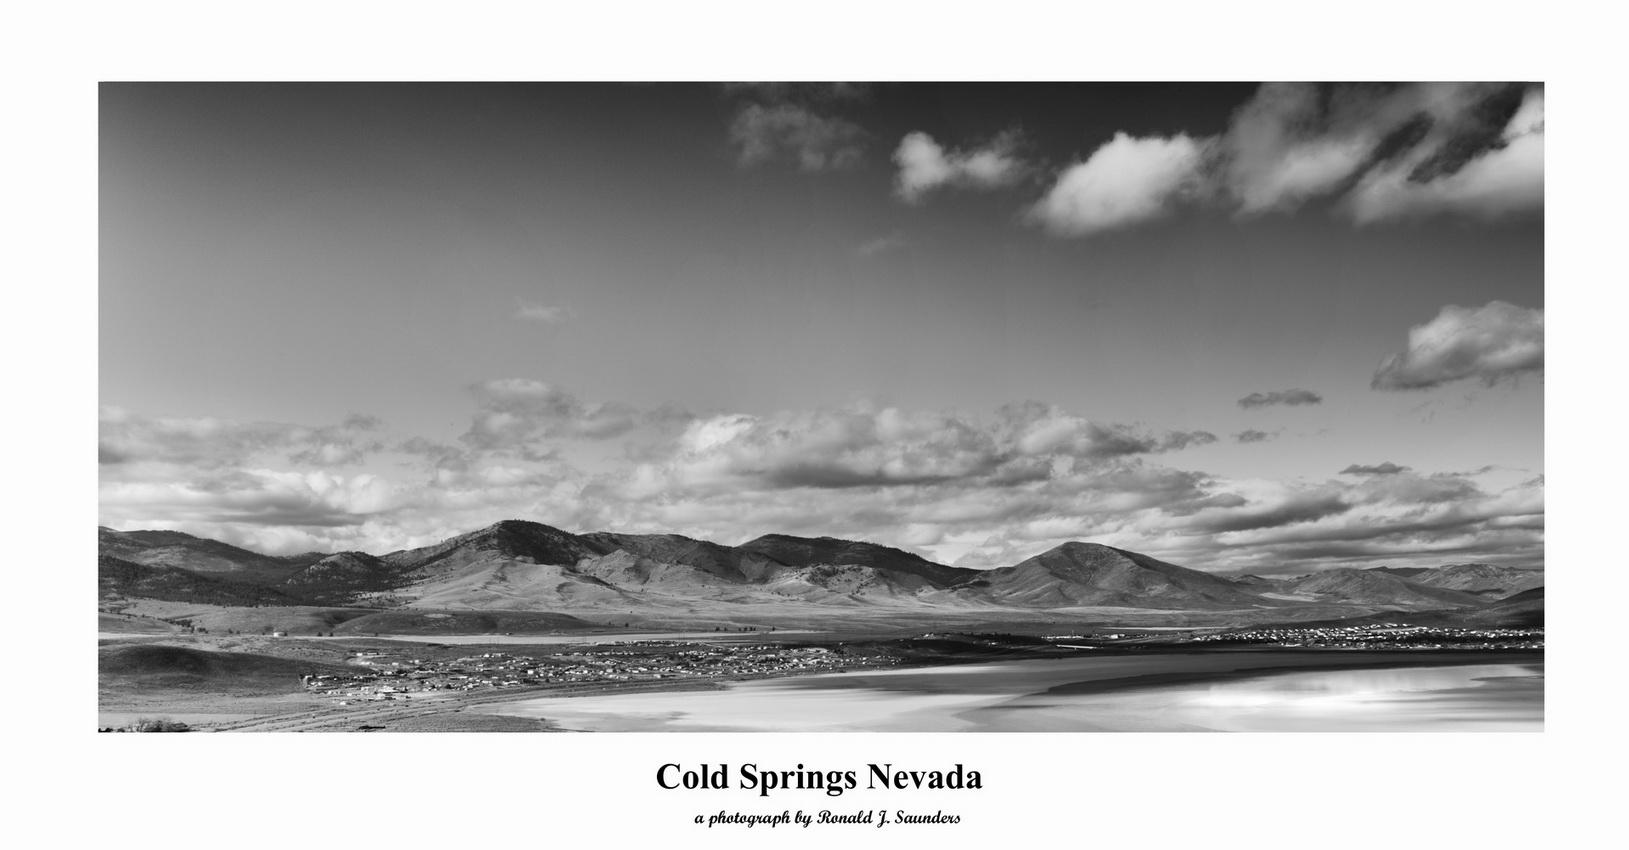 ron, saunders, ronald, ronald j saunders, landscape, photography, nevada, california, image, black, white, exhibition, cold springs, granit hills, Nevada, desert, photography, photo